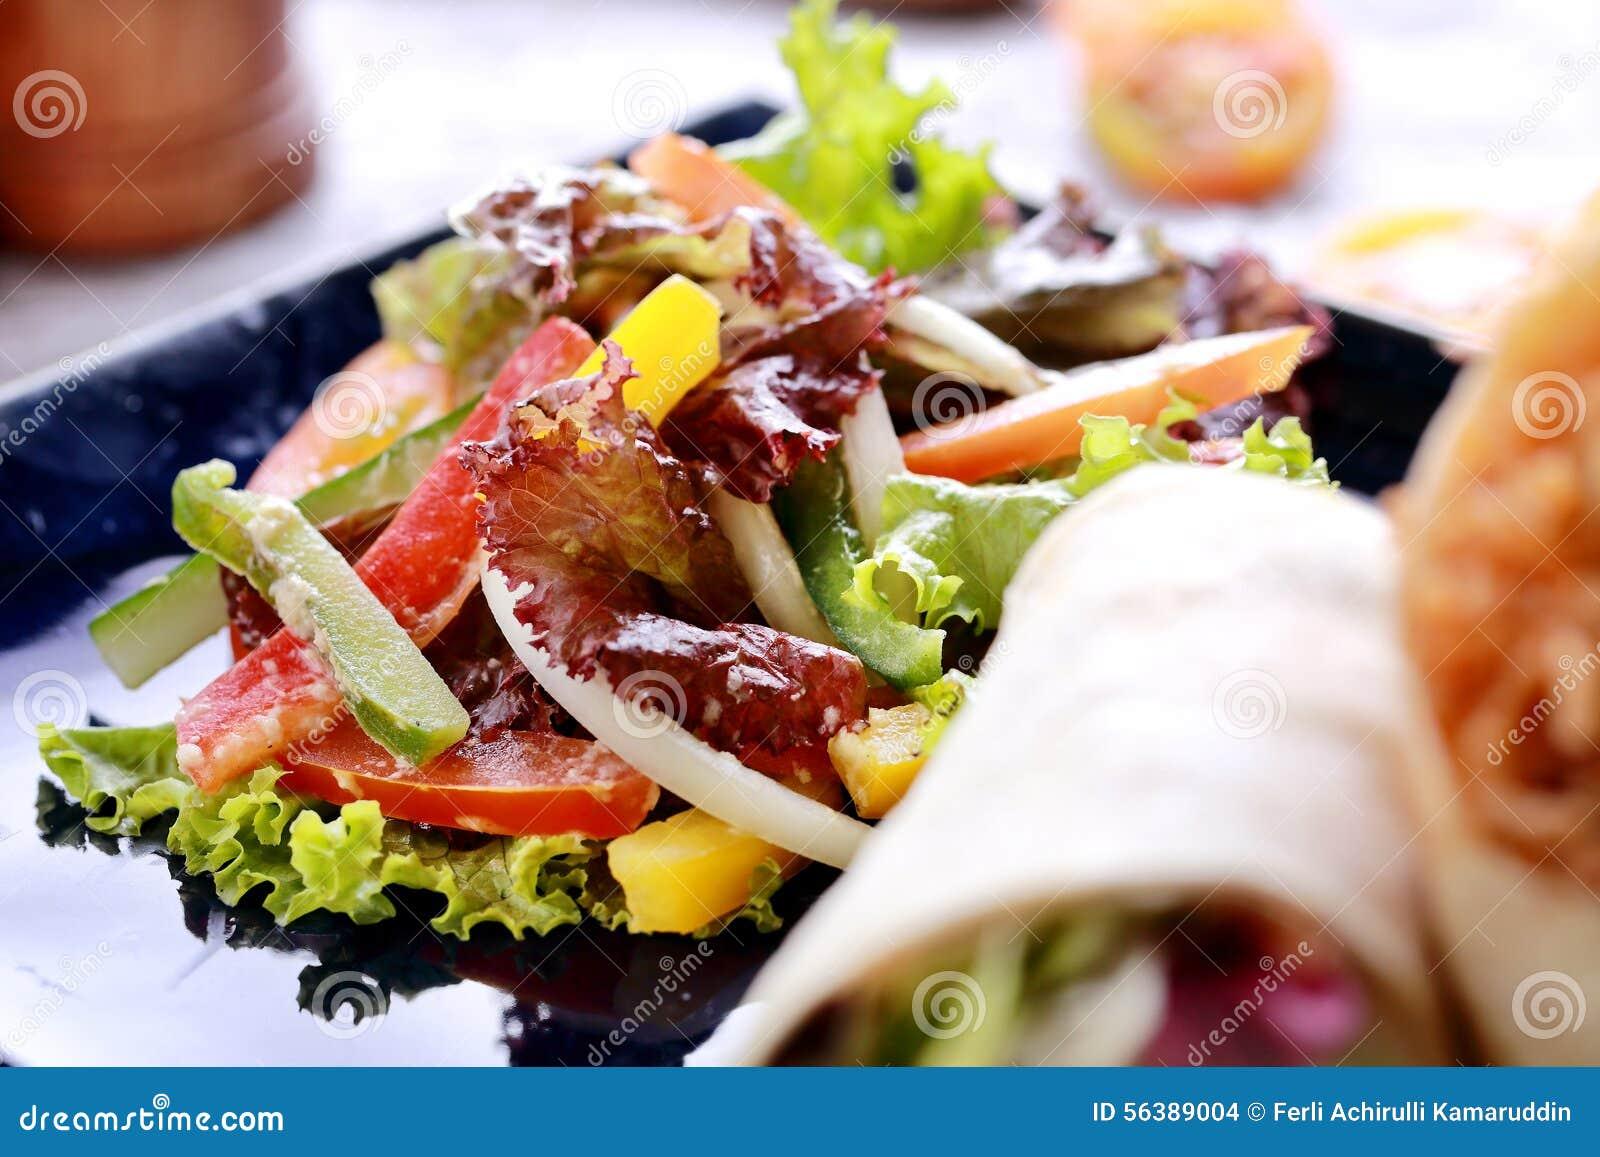 Mexican mango salsa with burritos